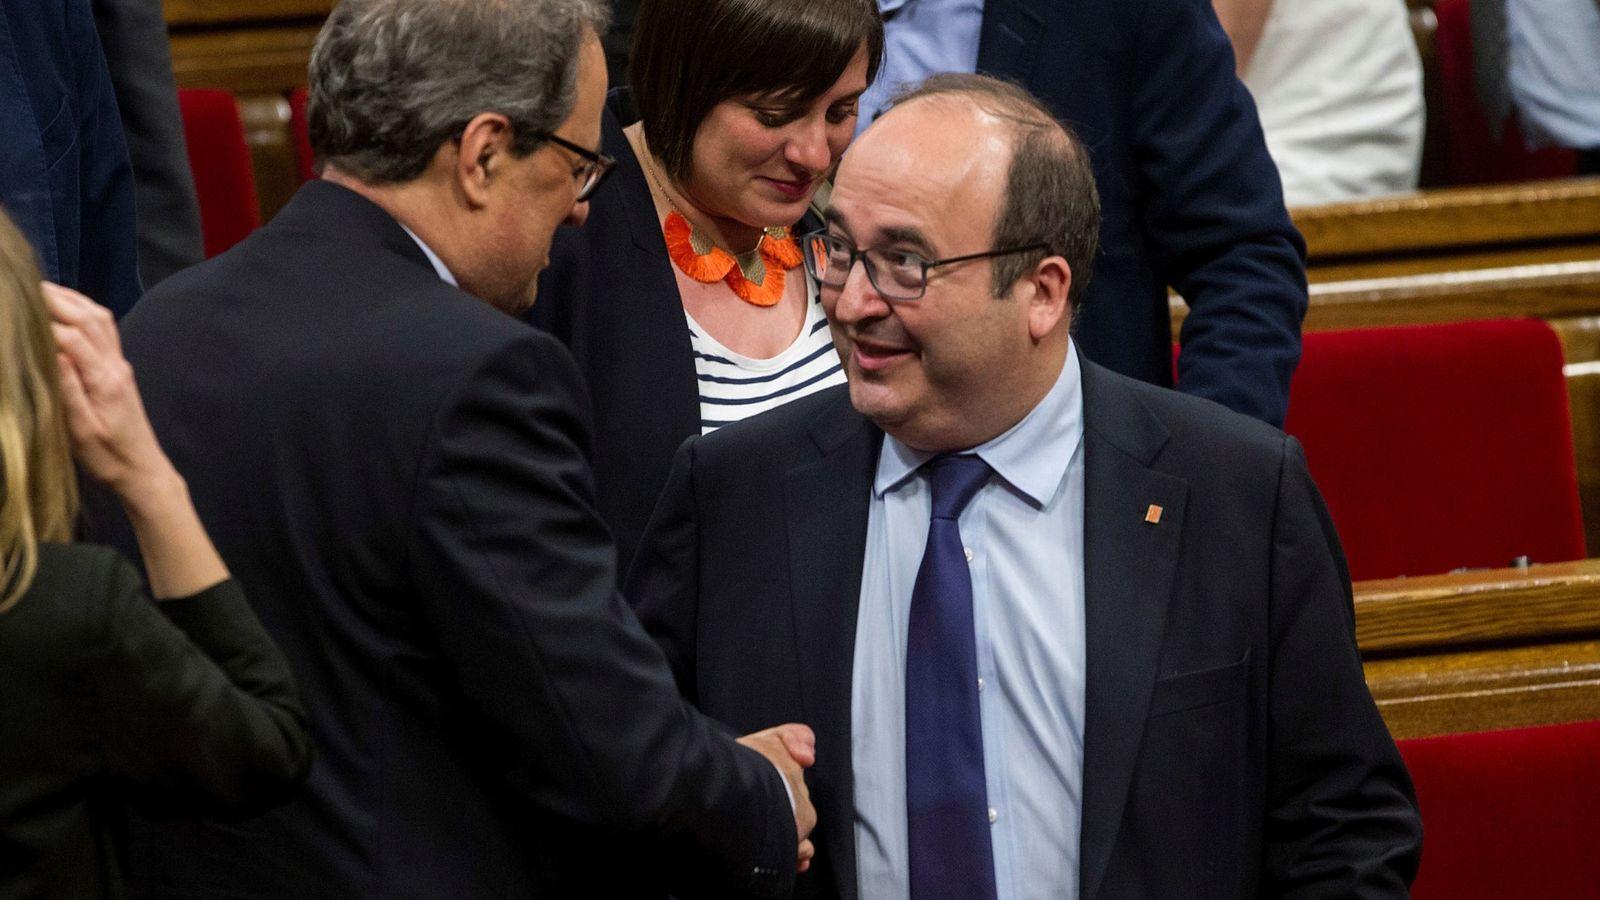 Foto: El presidente de la Generalitat, Quim Torra (i), saluda al primer secretario del PSC, Miquel Iceta. (EFE)